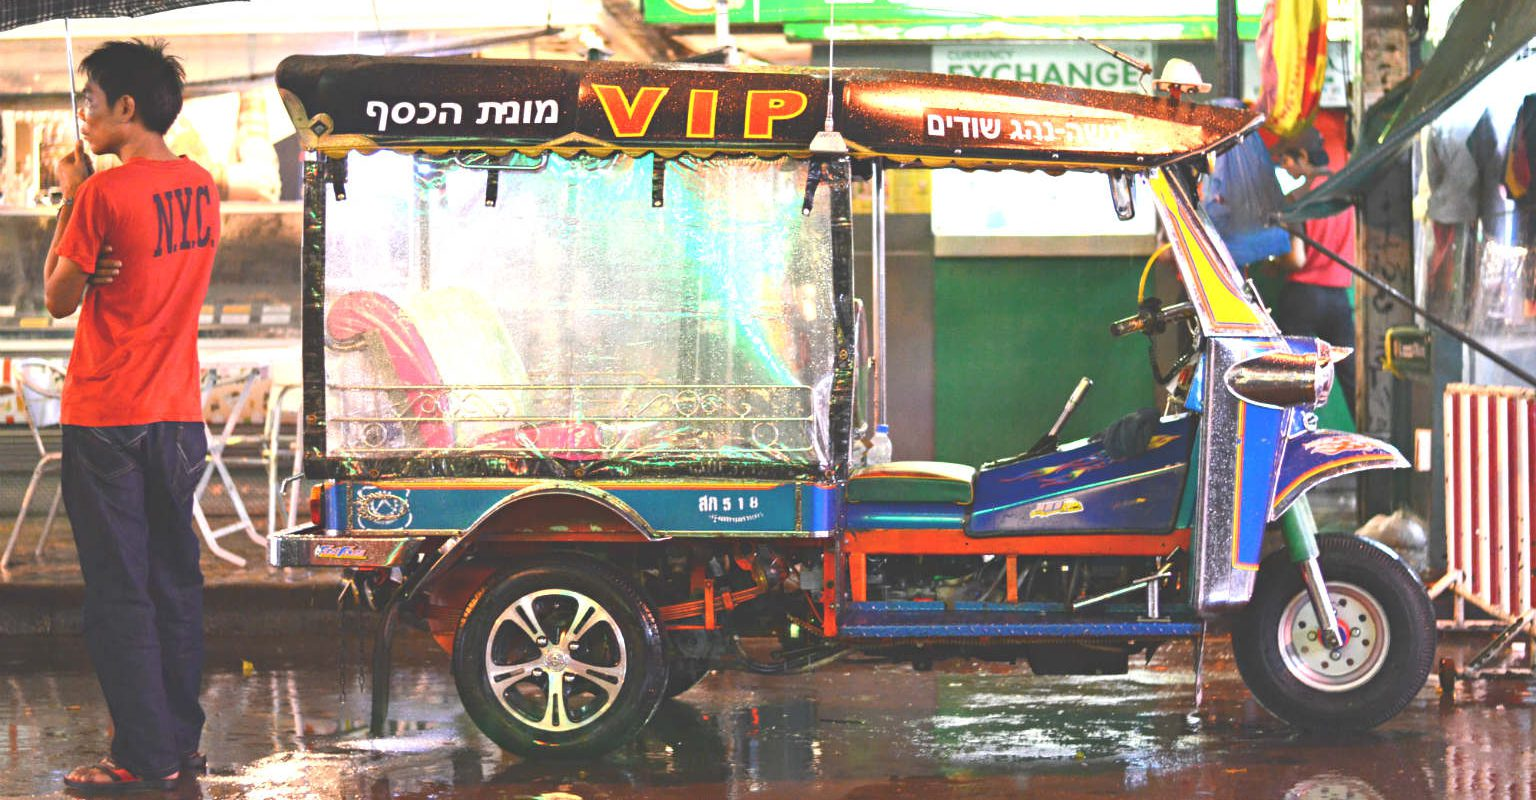 Vip tuk tuk op Khao San Road in Bangkok